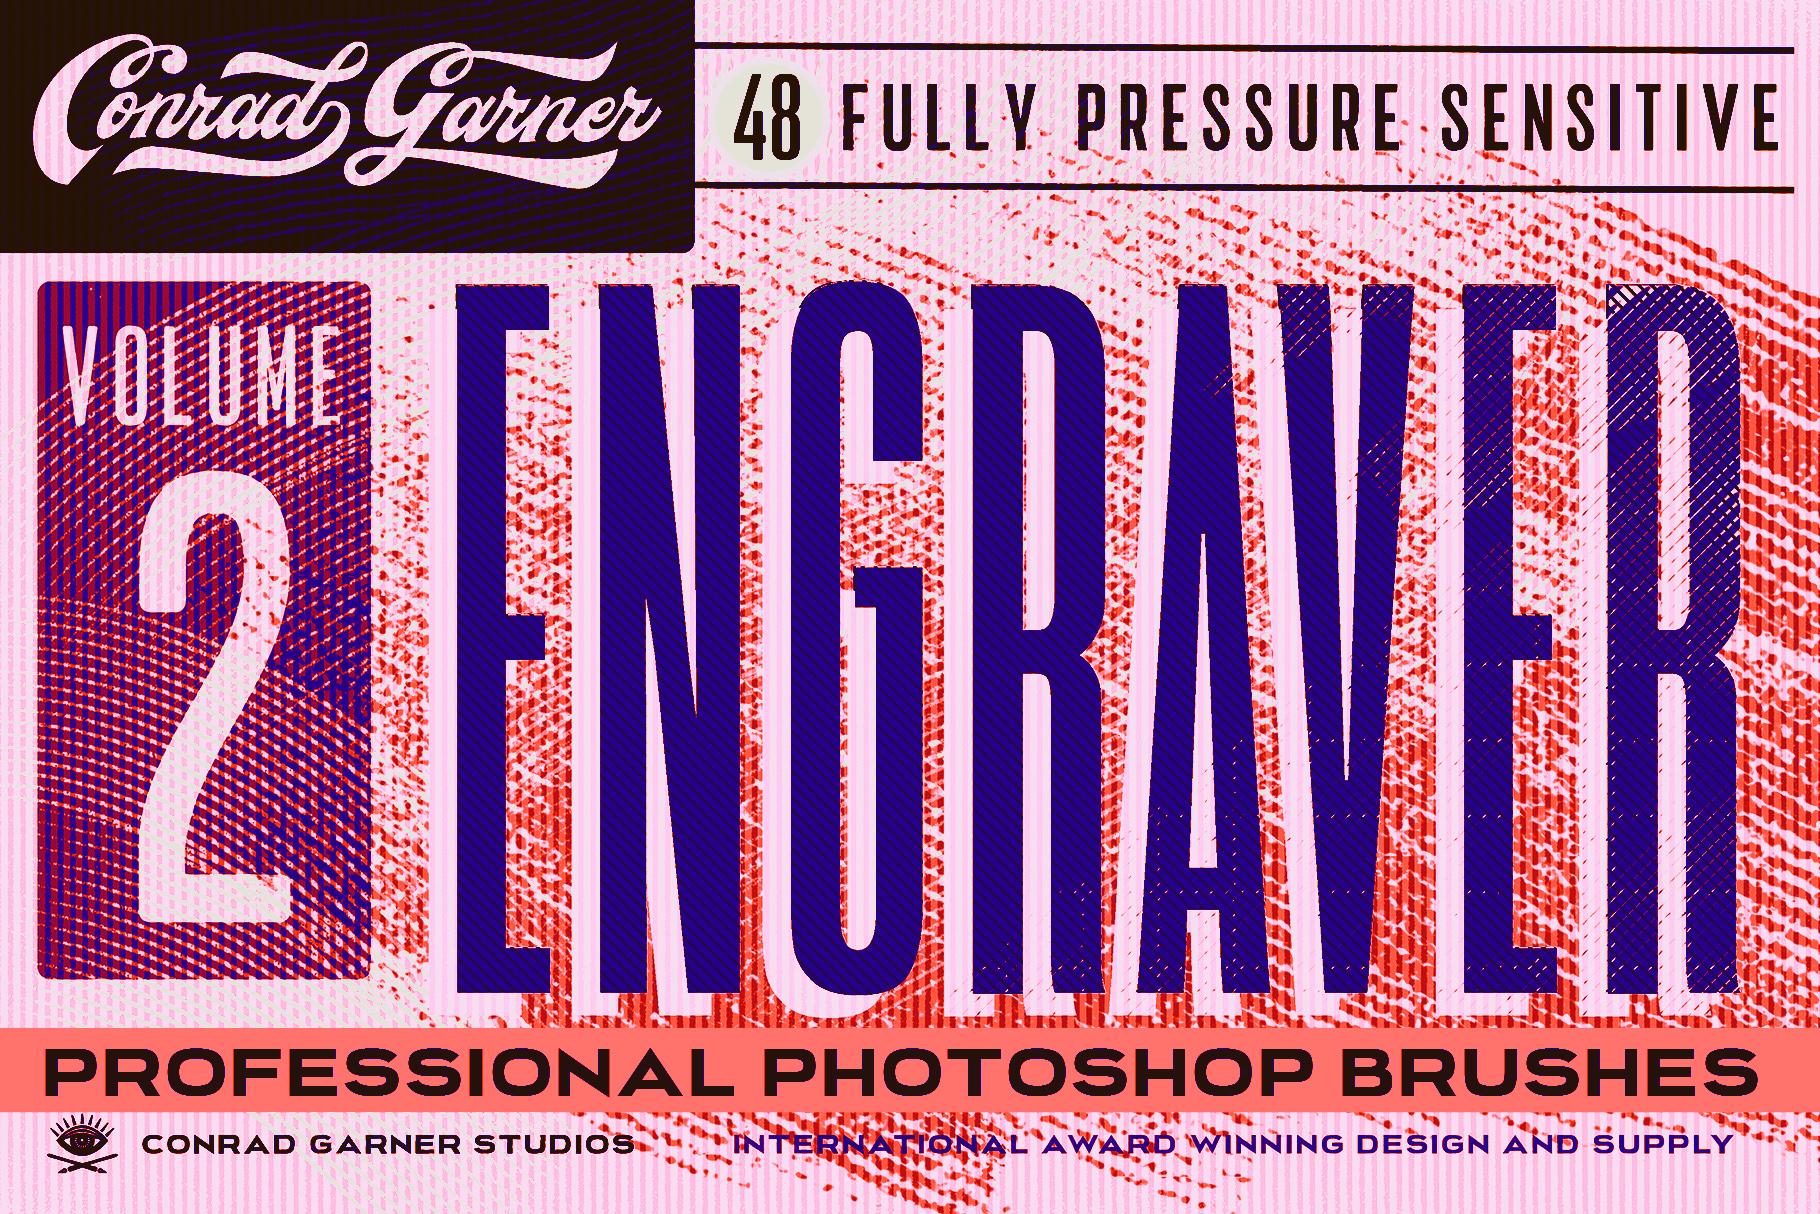 PS_BRUSHES Engravers-04 copy copy.jpg